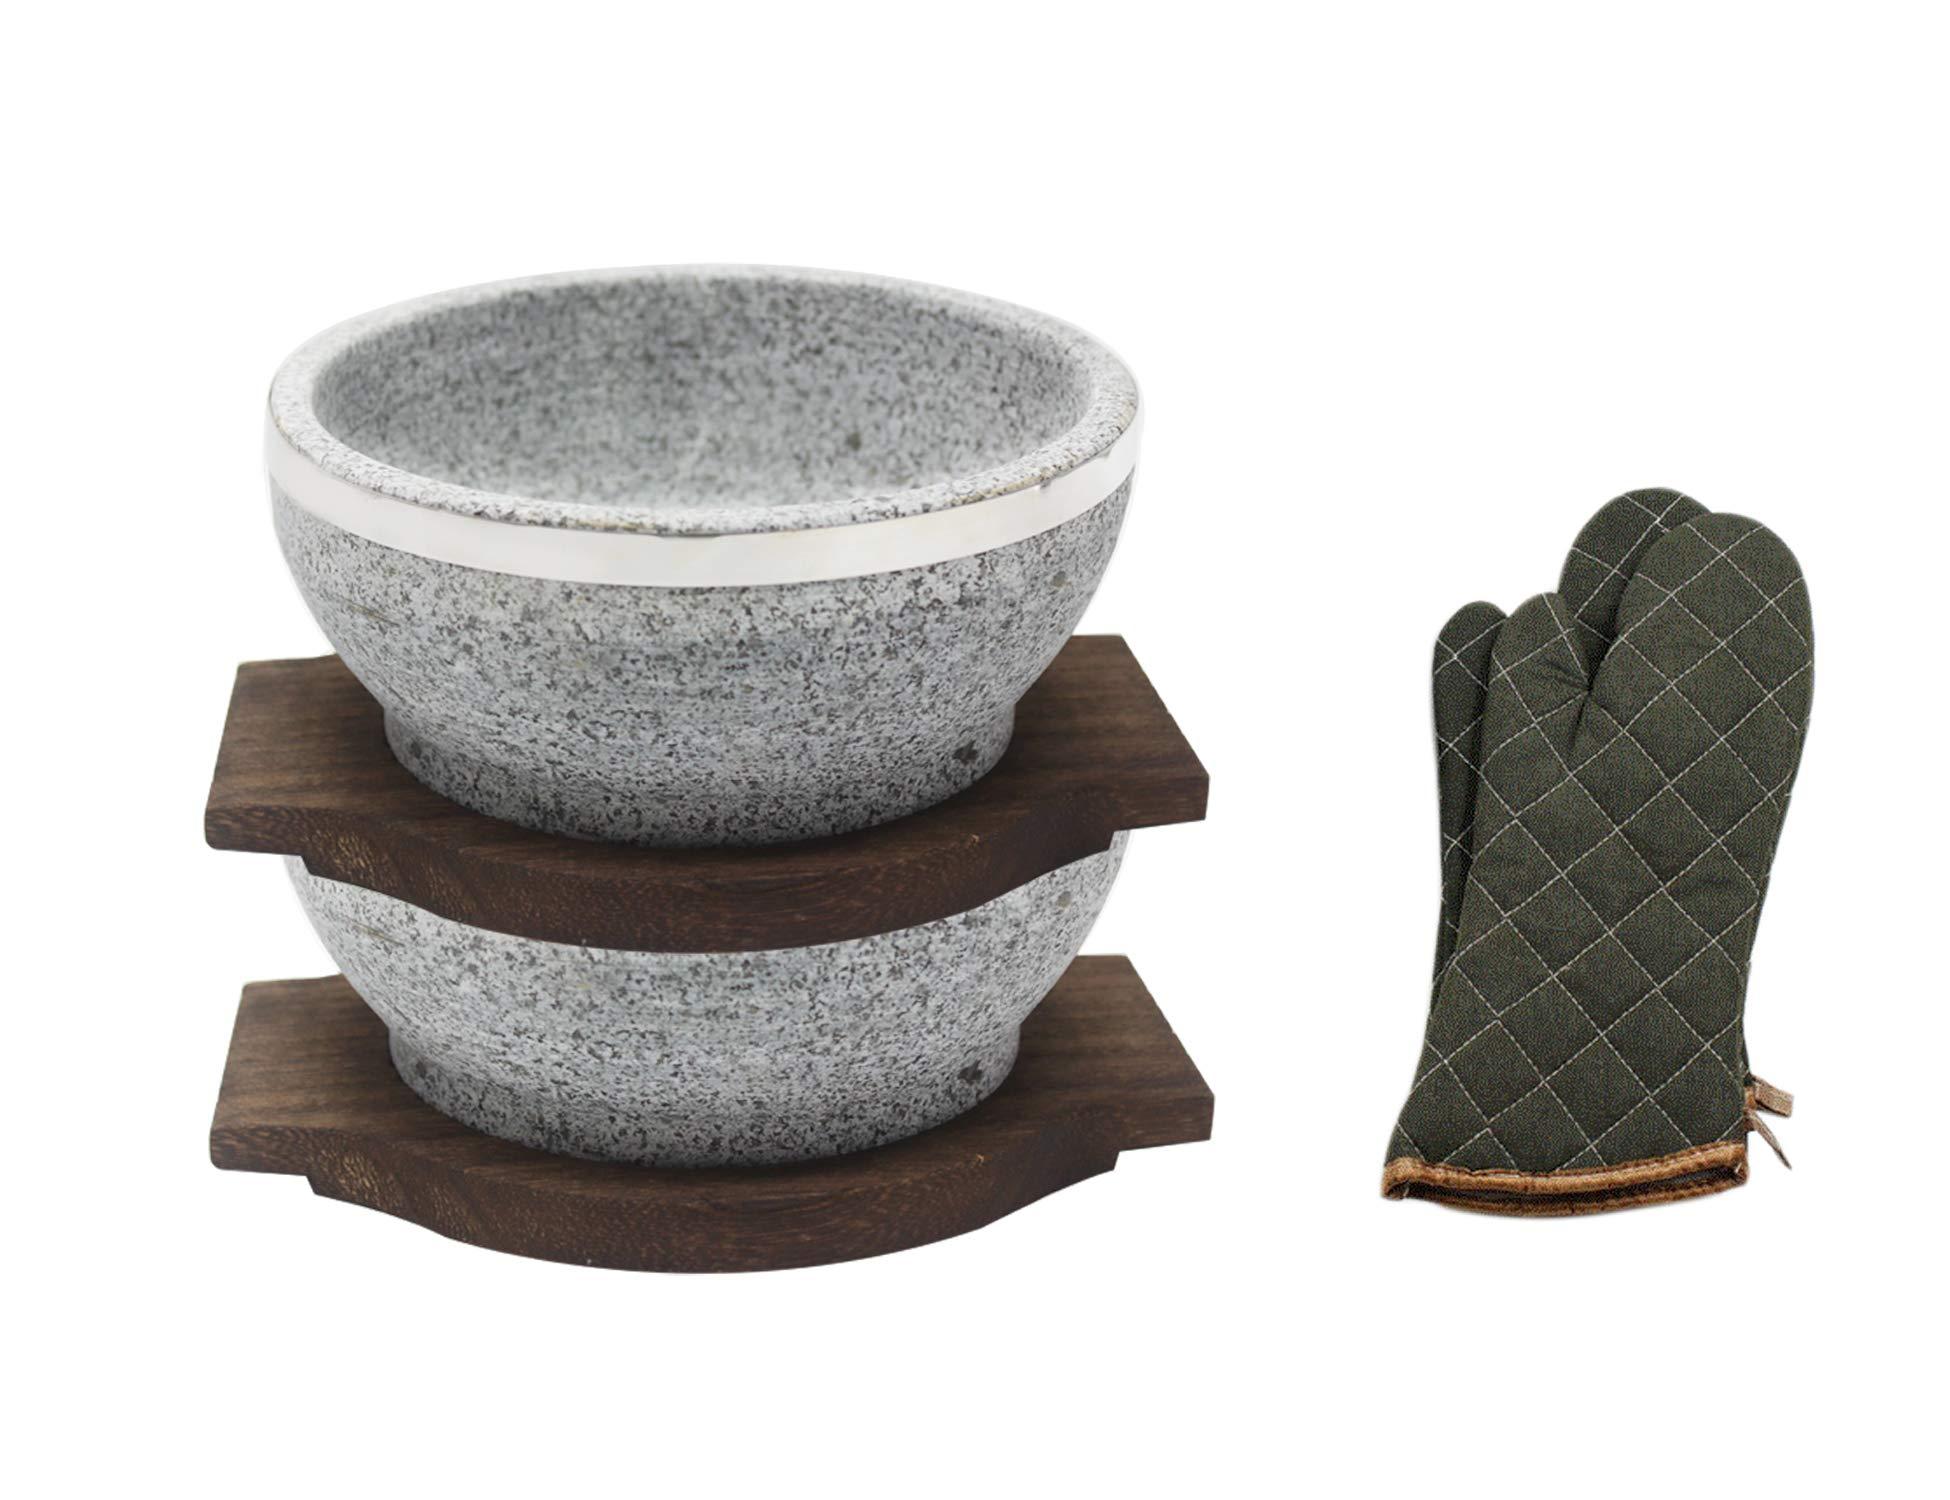 Natural Stone Dolsot Bibimbap Bowls, 32-Oz (Two Wood base + A pair of Cooking Gloves), Set of 2,Cooking Korean Soup and Food.